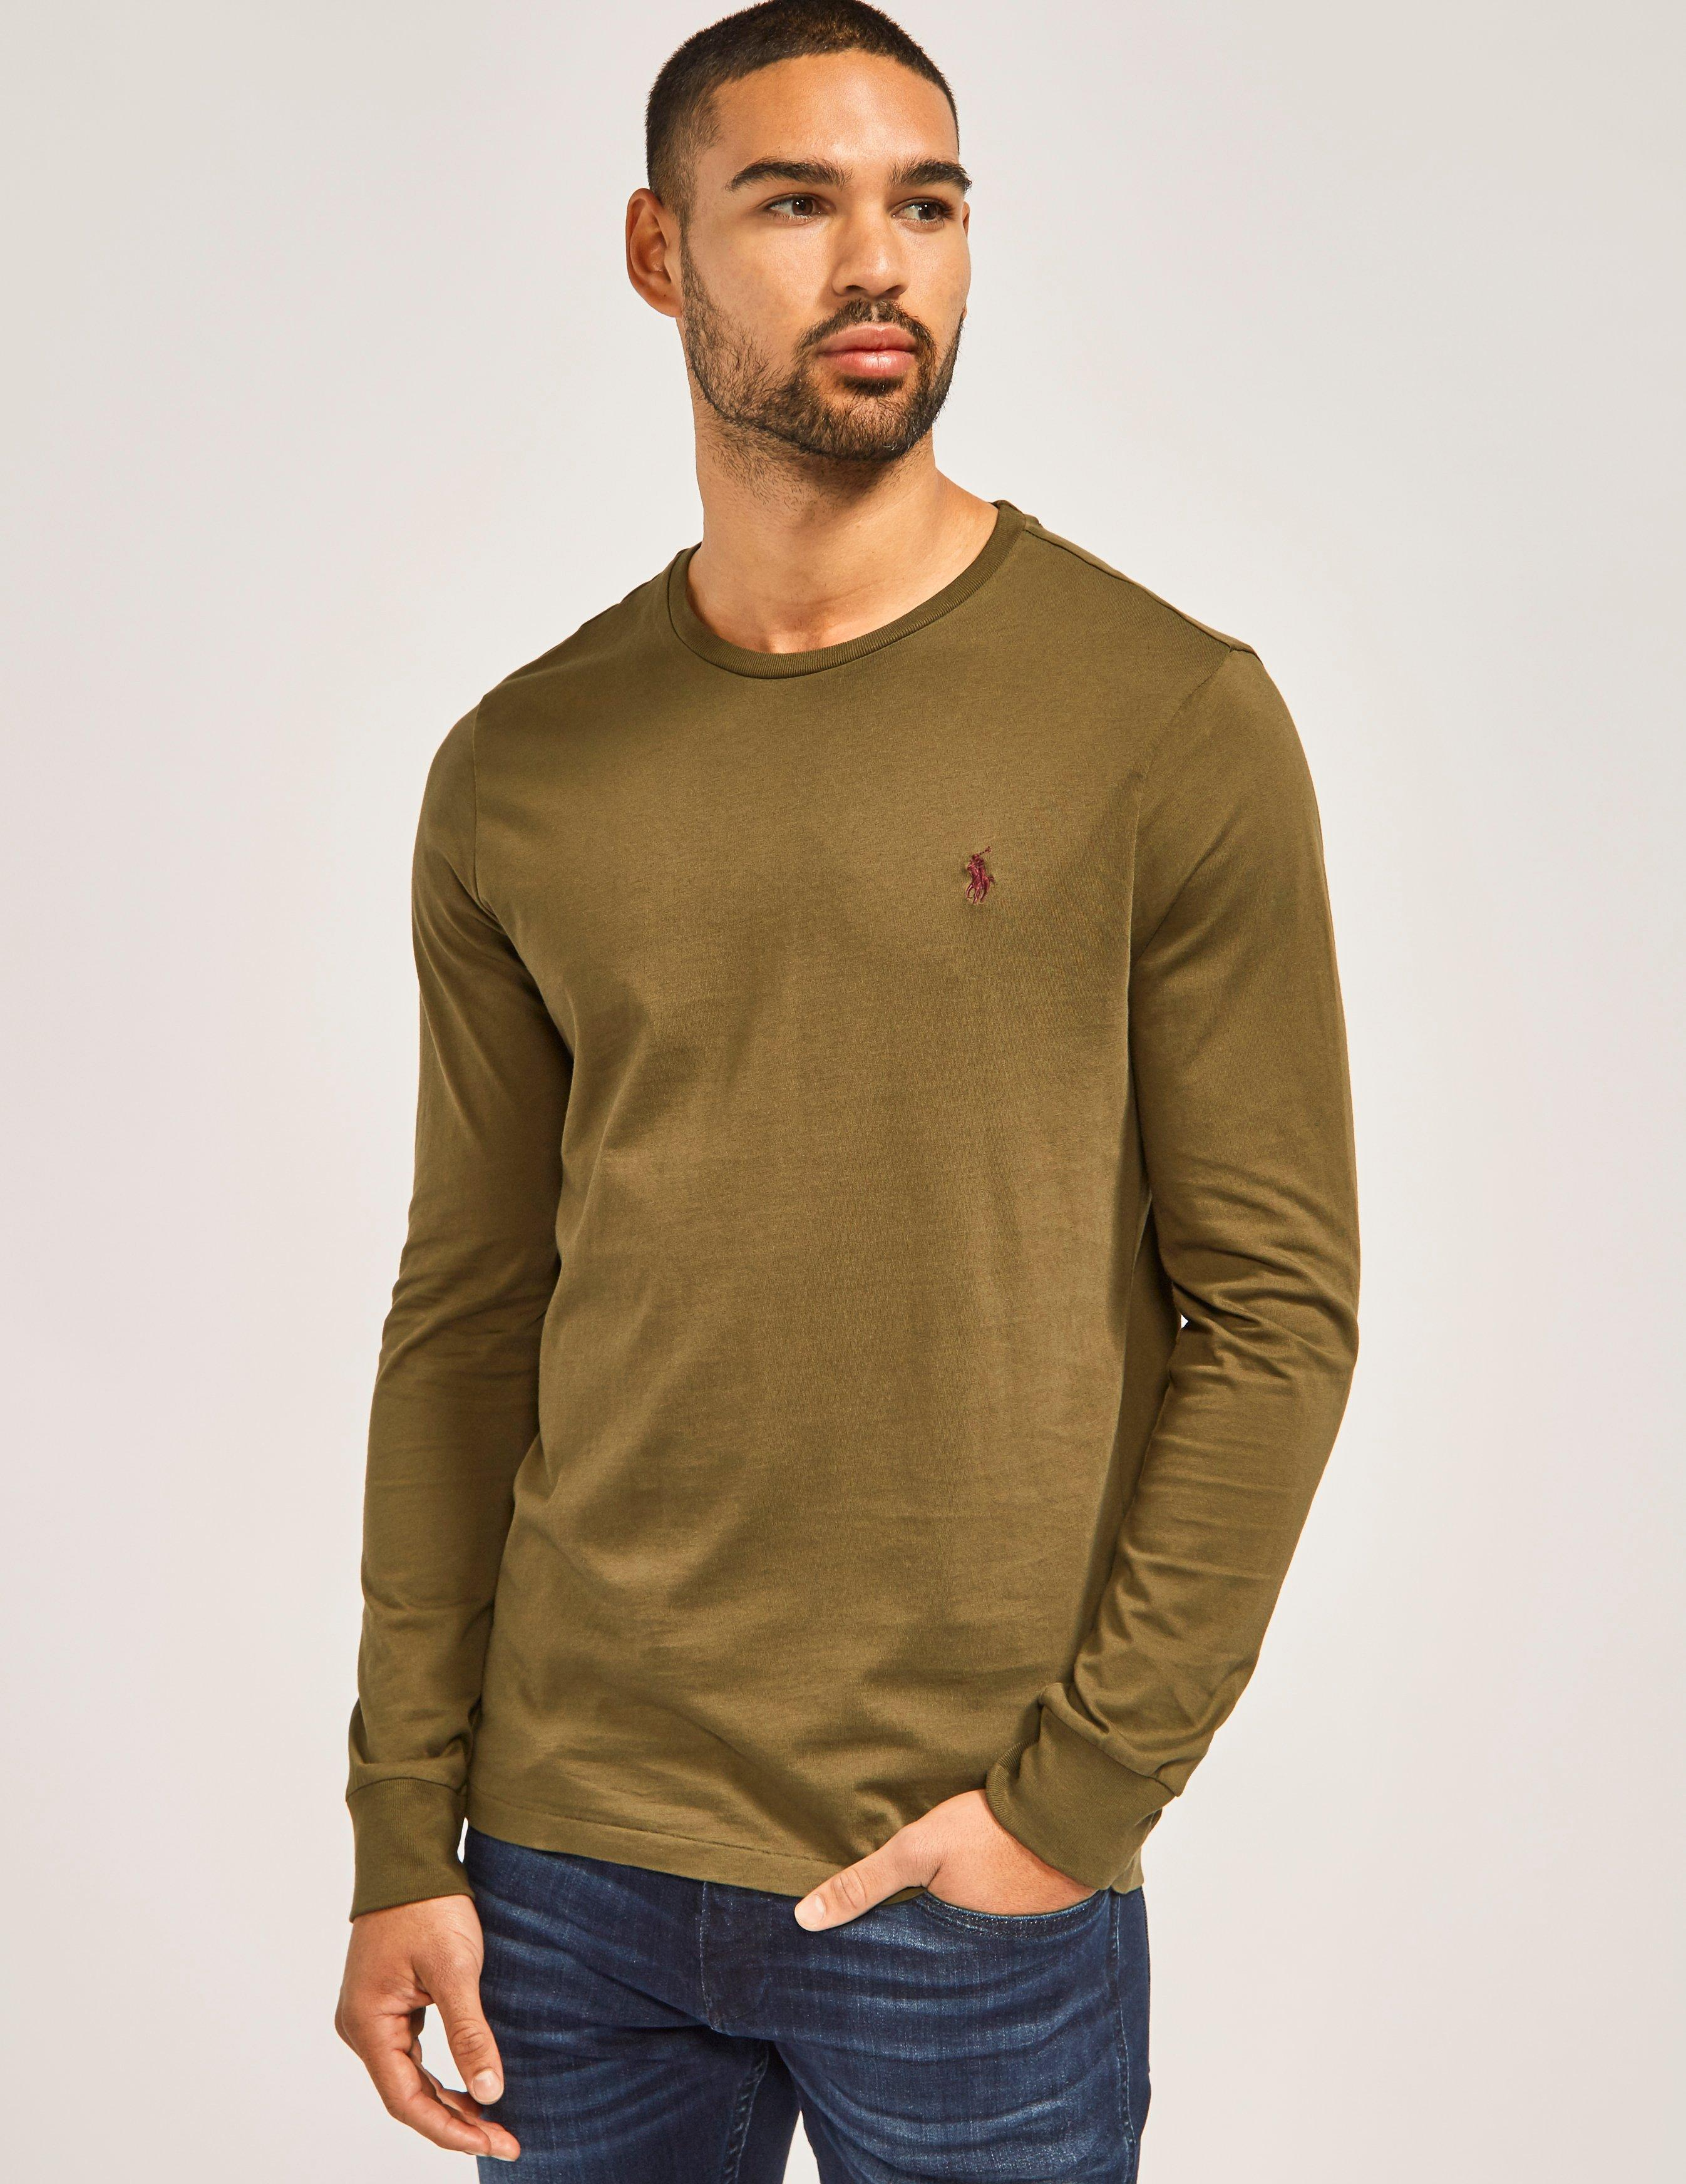 Lyst Polo Ralph Lauren Crew Neck Long Sleeve T Shirt In